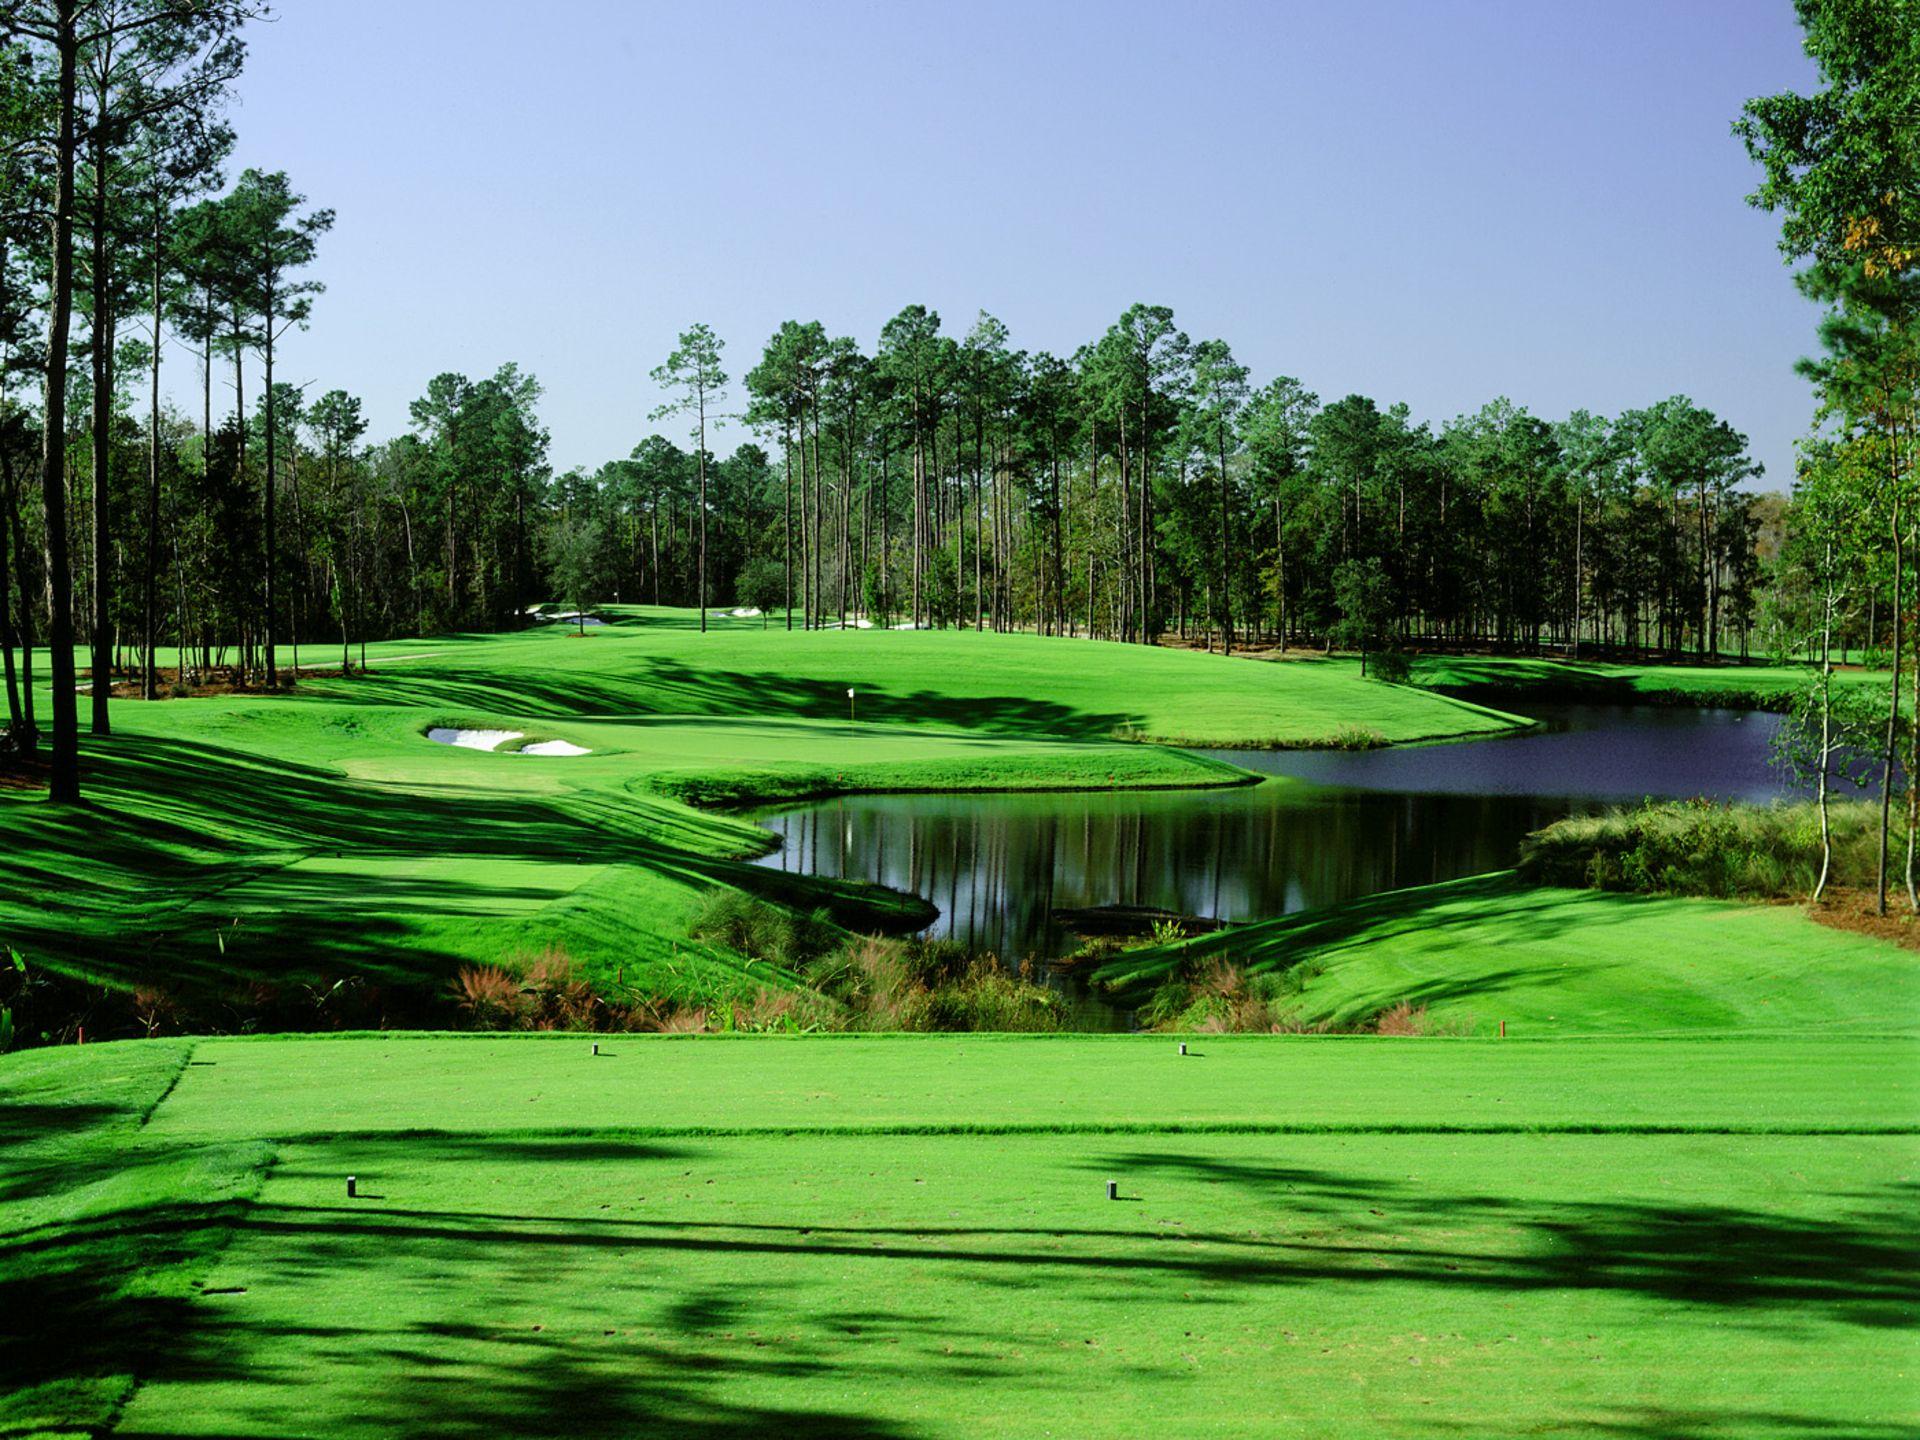 Golf Wallpaper Hd | Images Wallpapers | Pinterest | Wallpaper and ...